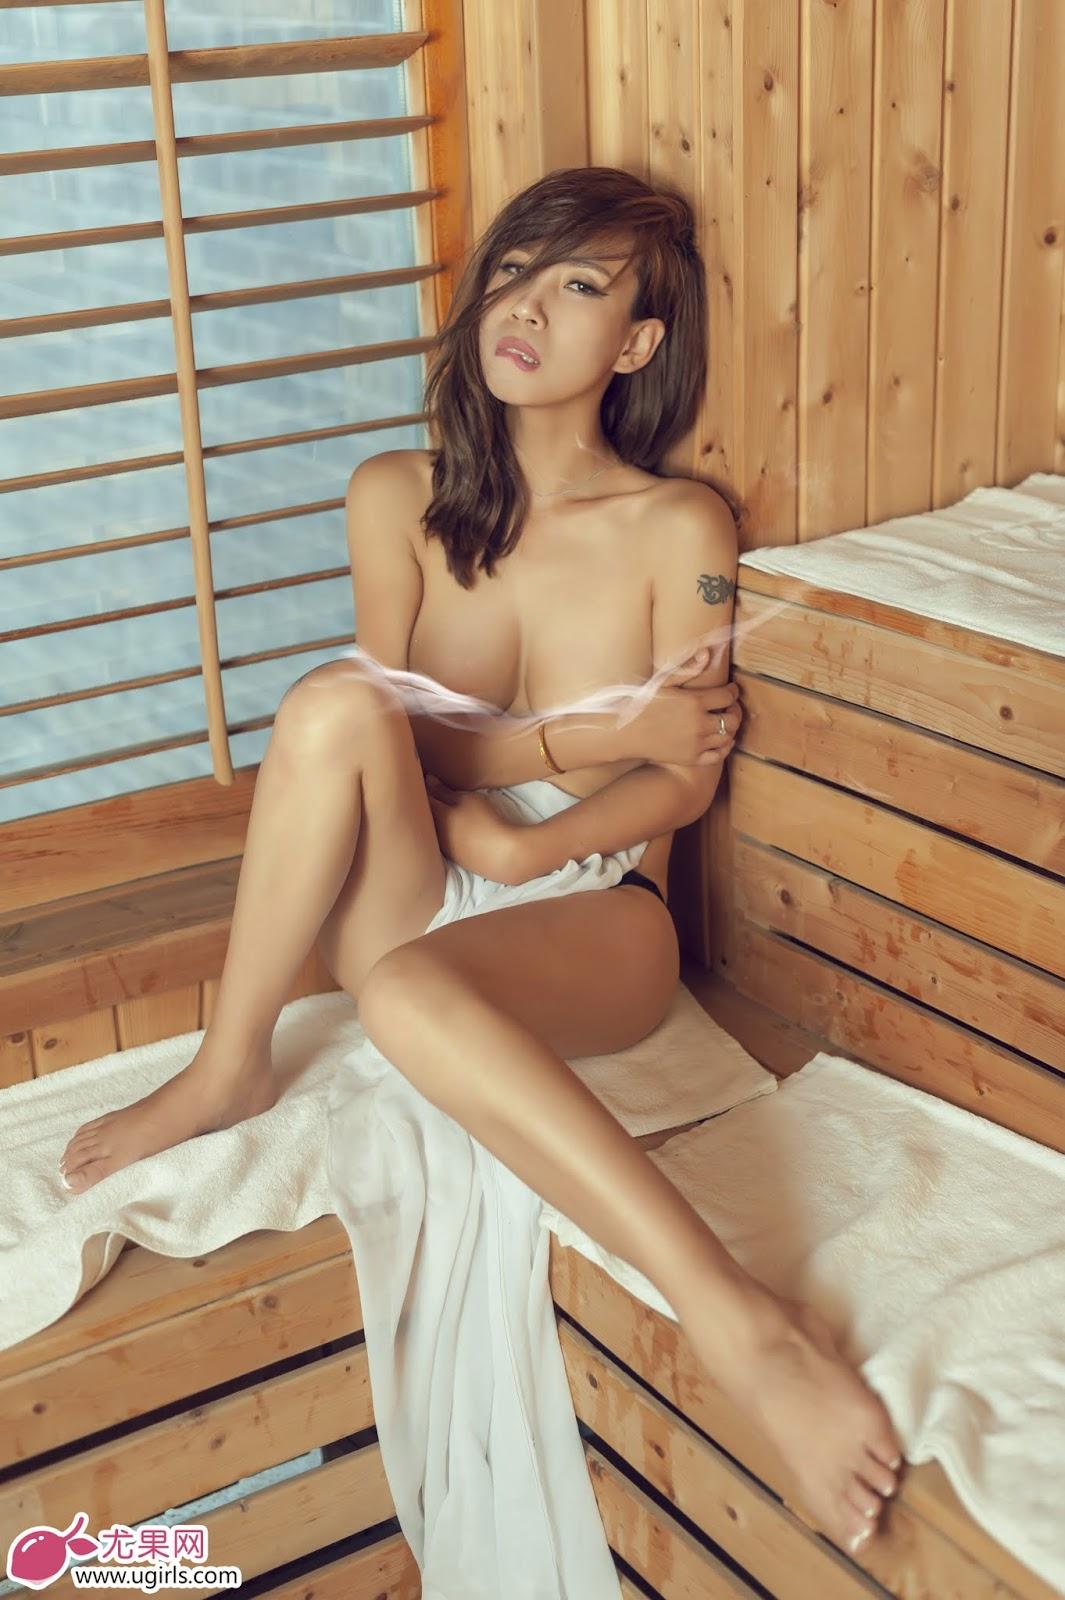 DLS 0607 - Hot Girl Ugirls No.021 Model: 田依依